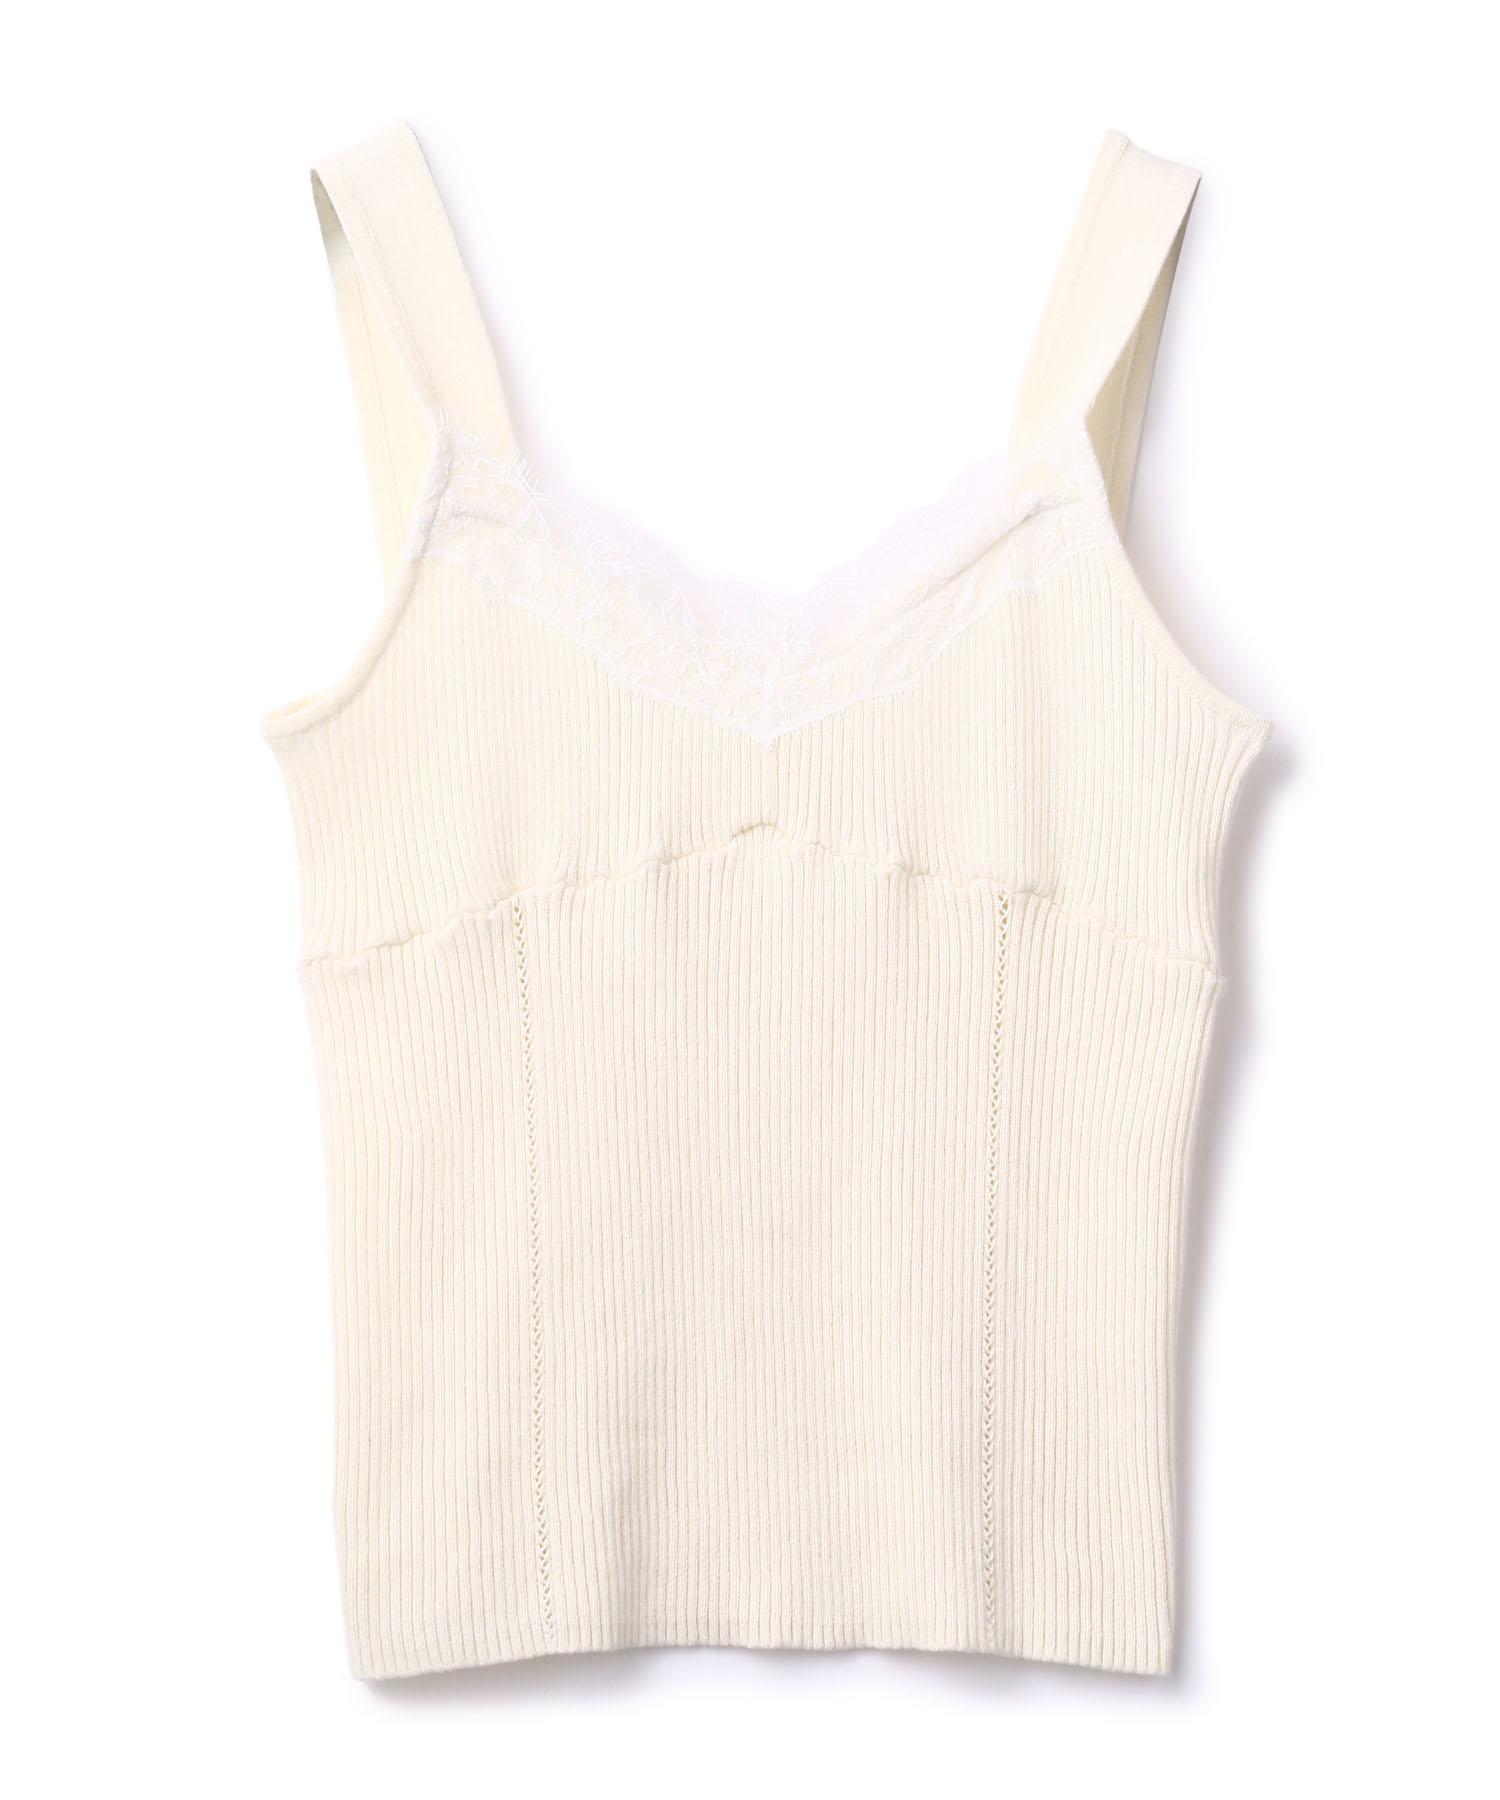 Lace Lib Knit Camisole